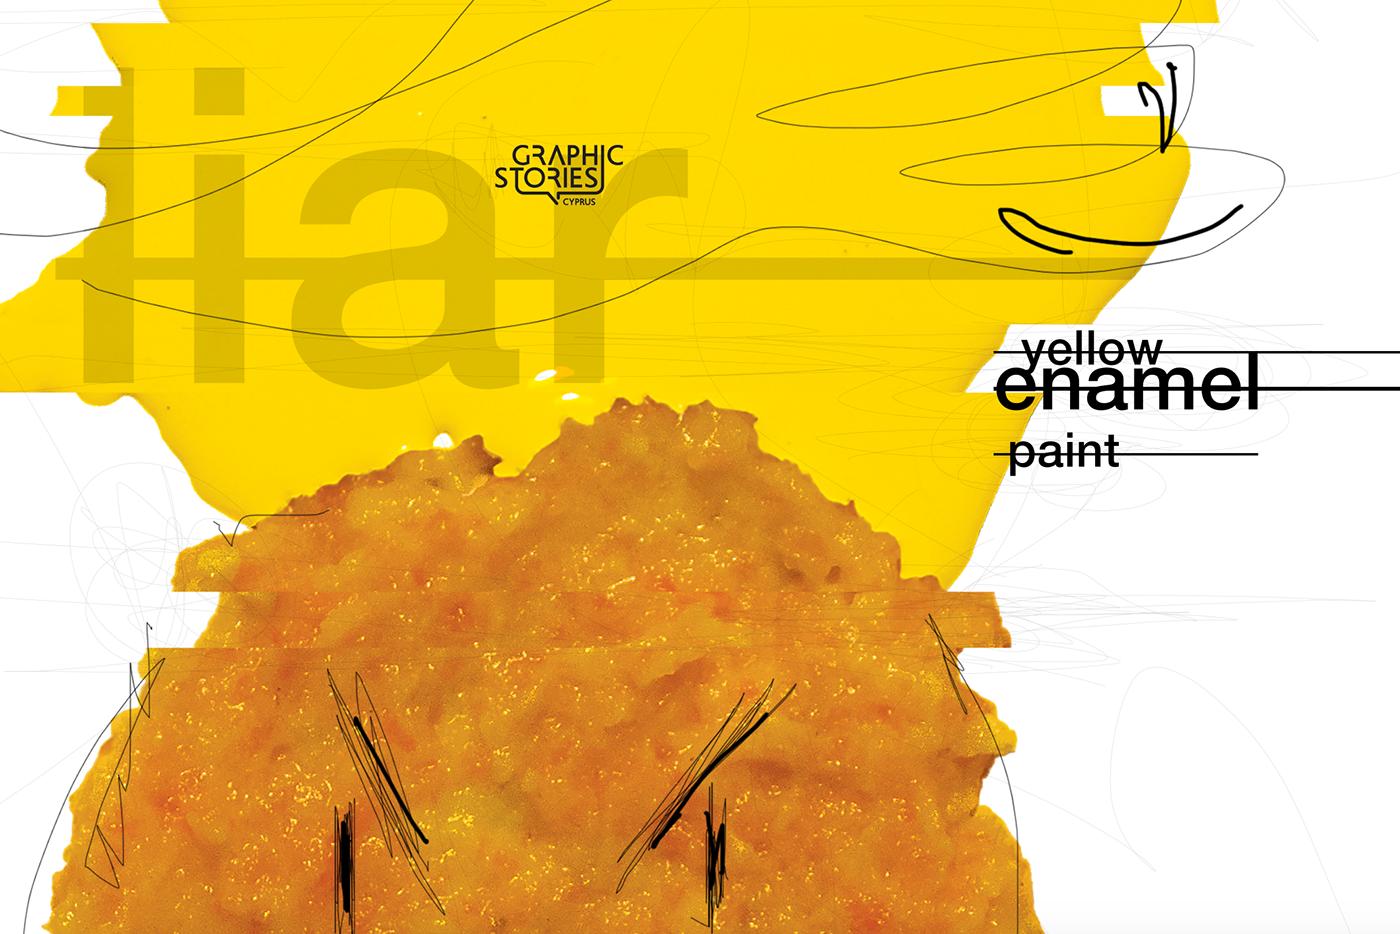 Graphic Stories Cyprus Francesco Mazzenga poster design Poster Design Exhibition  Trump David Carson